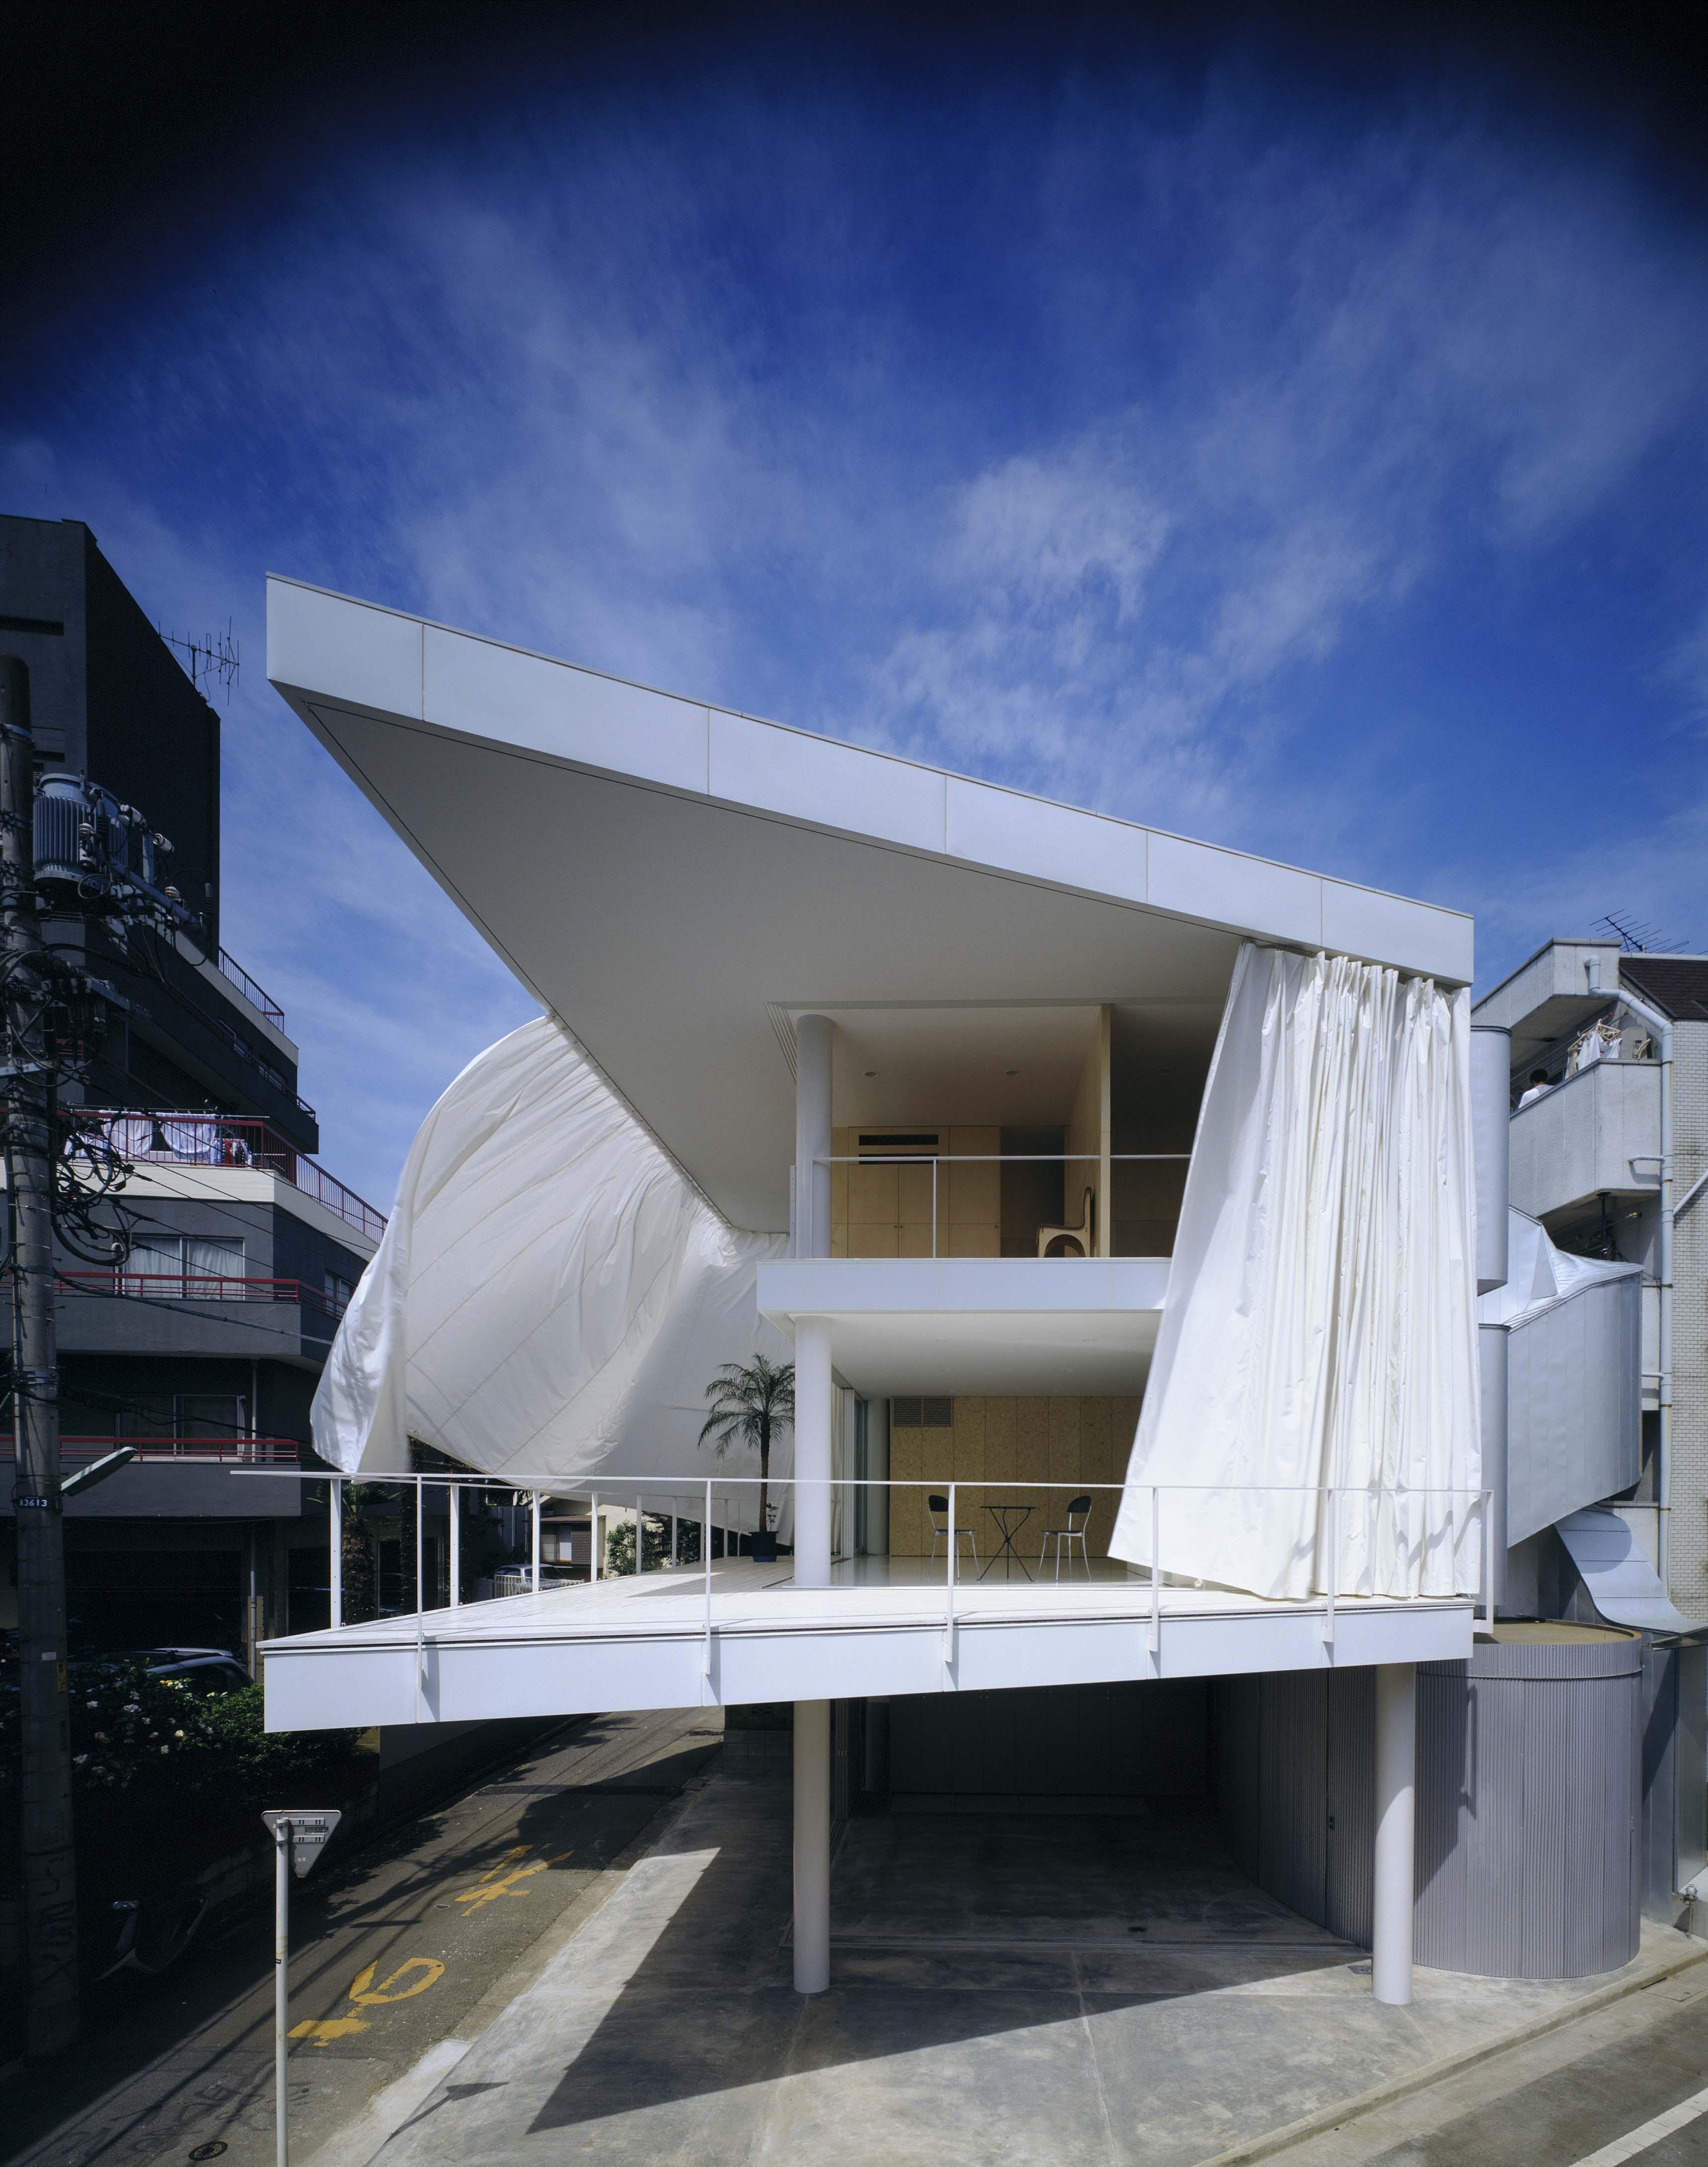 Shigeru Ban, Curtain wall house (Case Study House 7), Tokyo, 1965